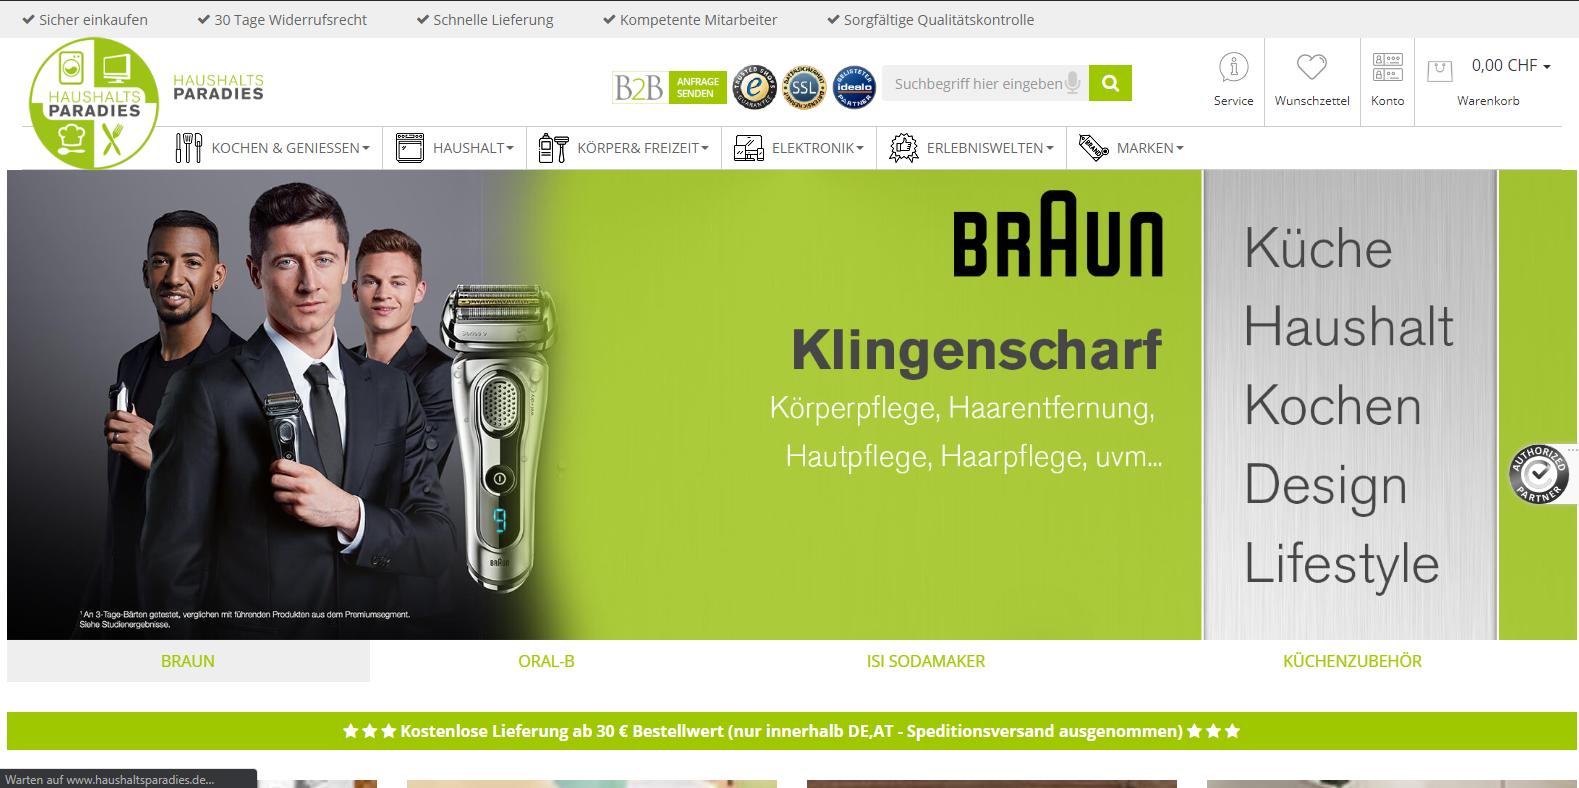 Haushaltsparadies GmbH